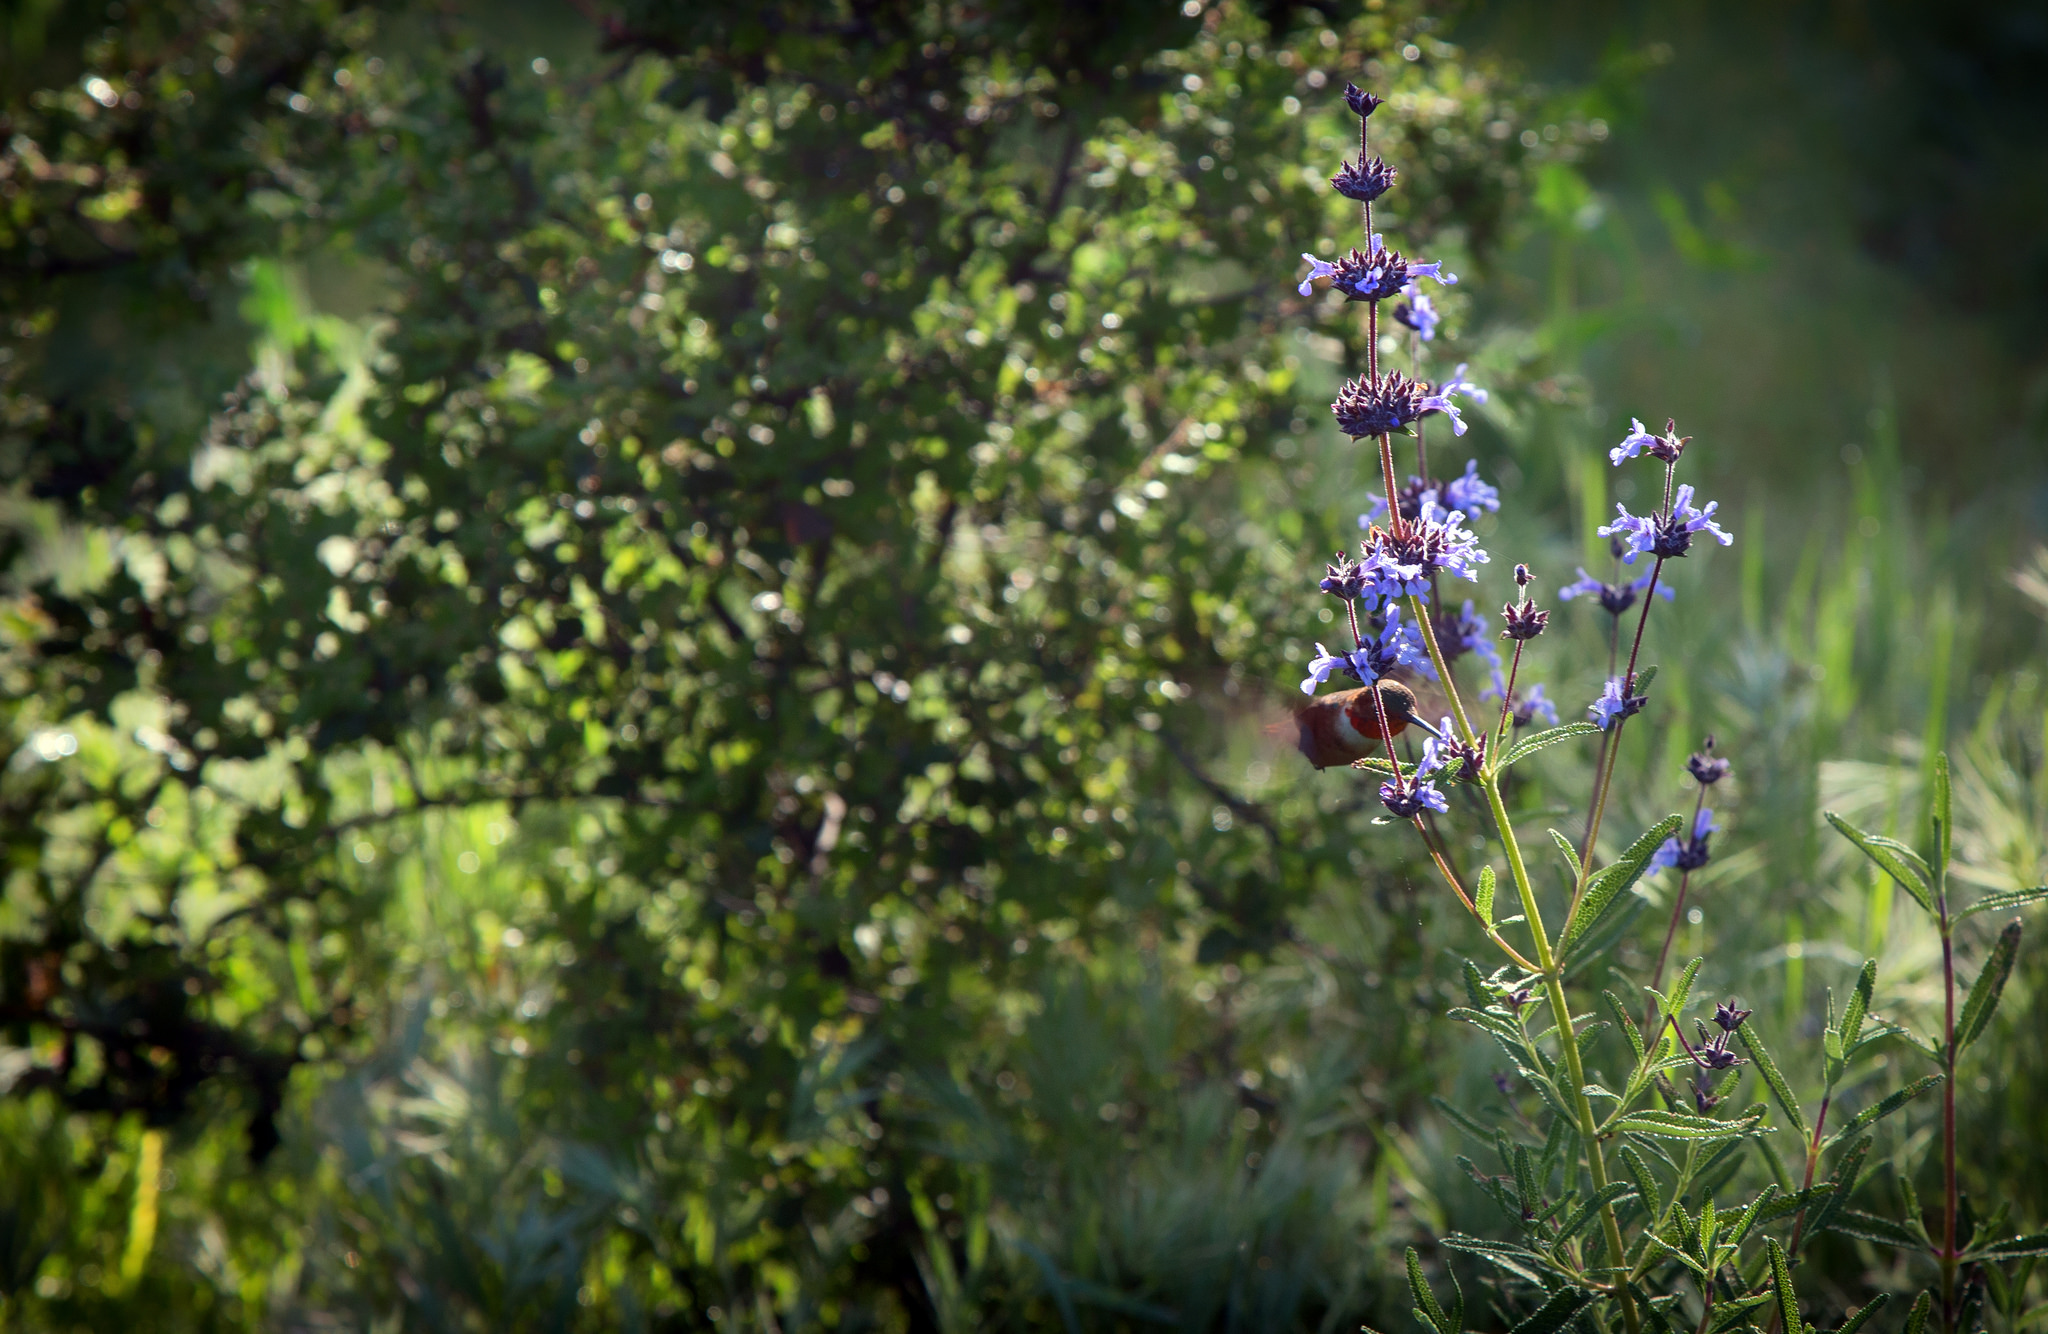 Hummingbird in the wildflowers